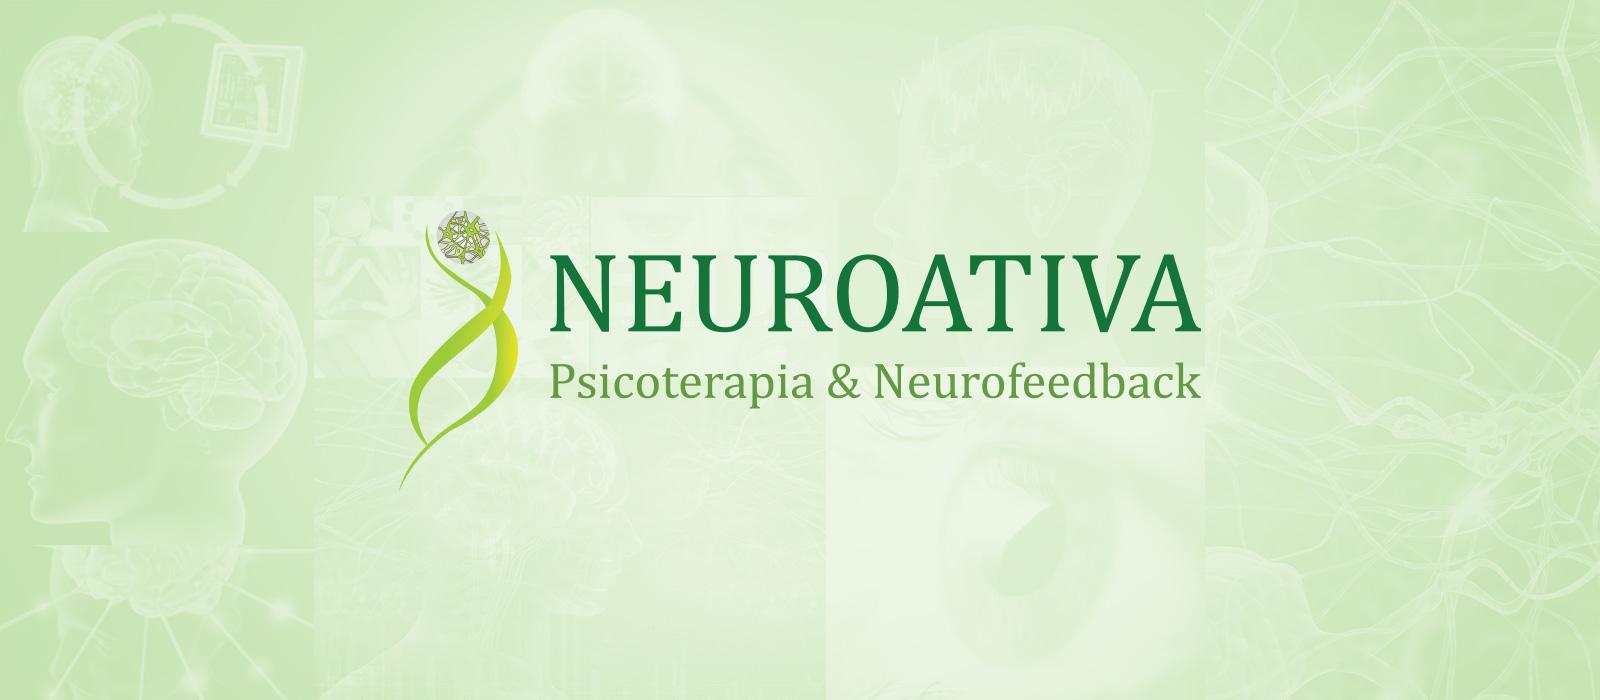 Marca Neuroativa